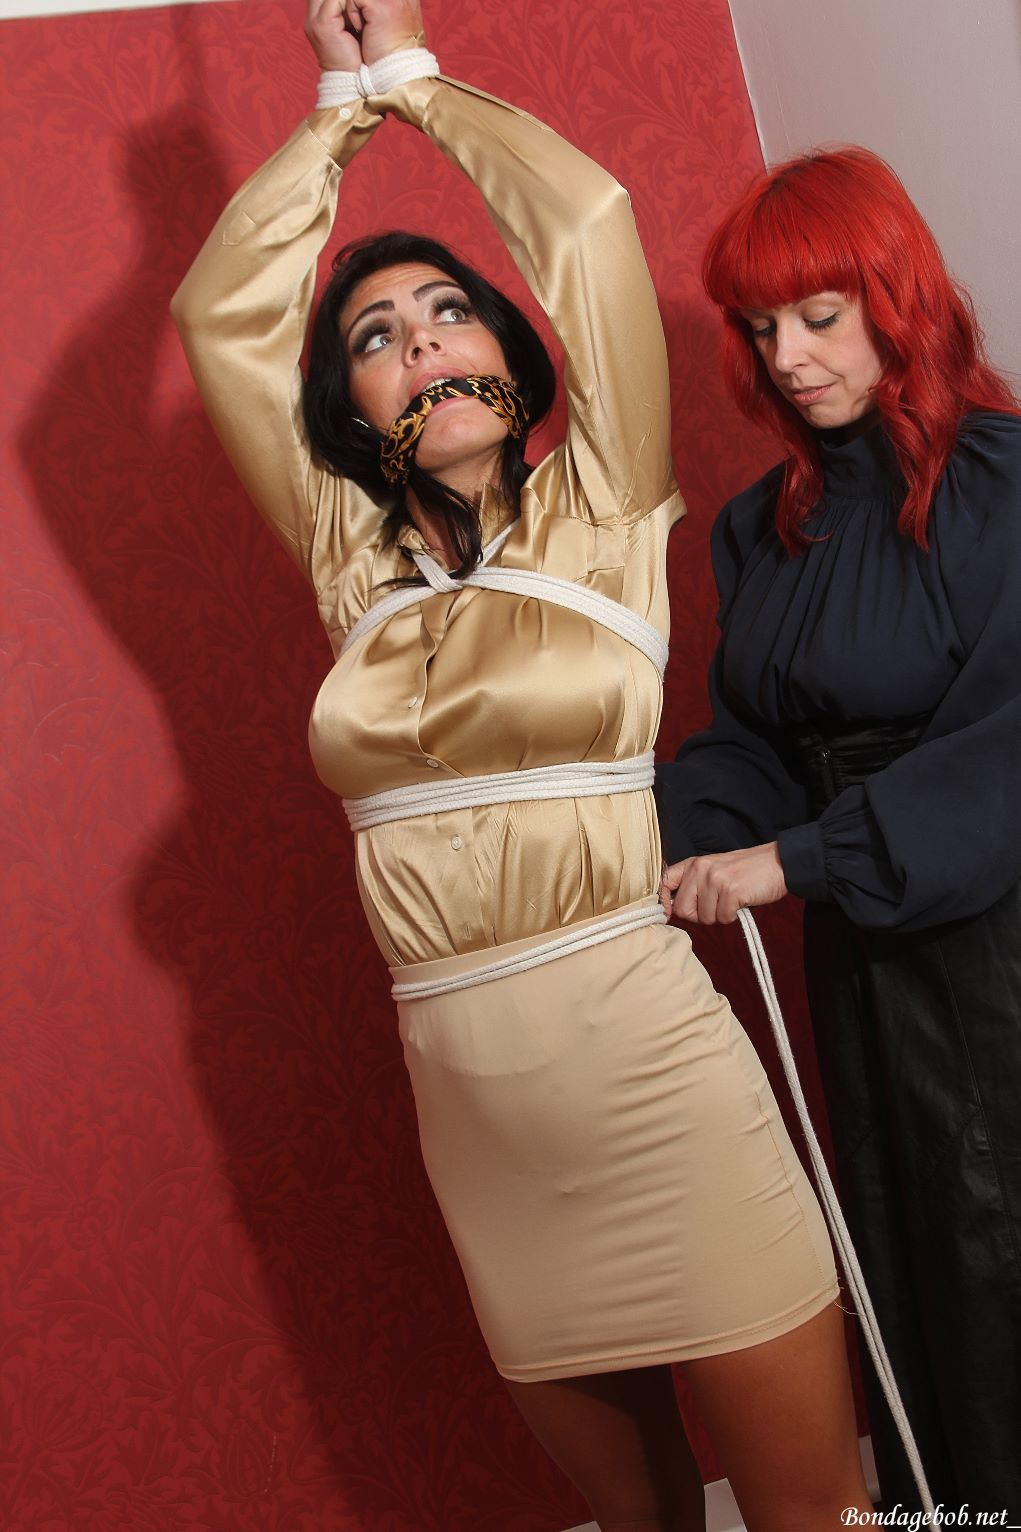 Bianca J & Temptress Kate in bondage.